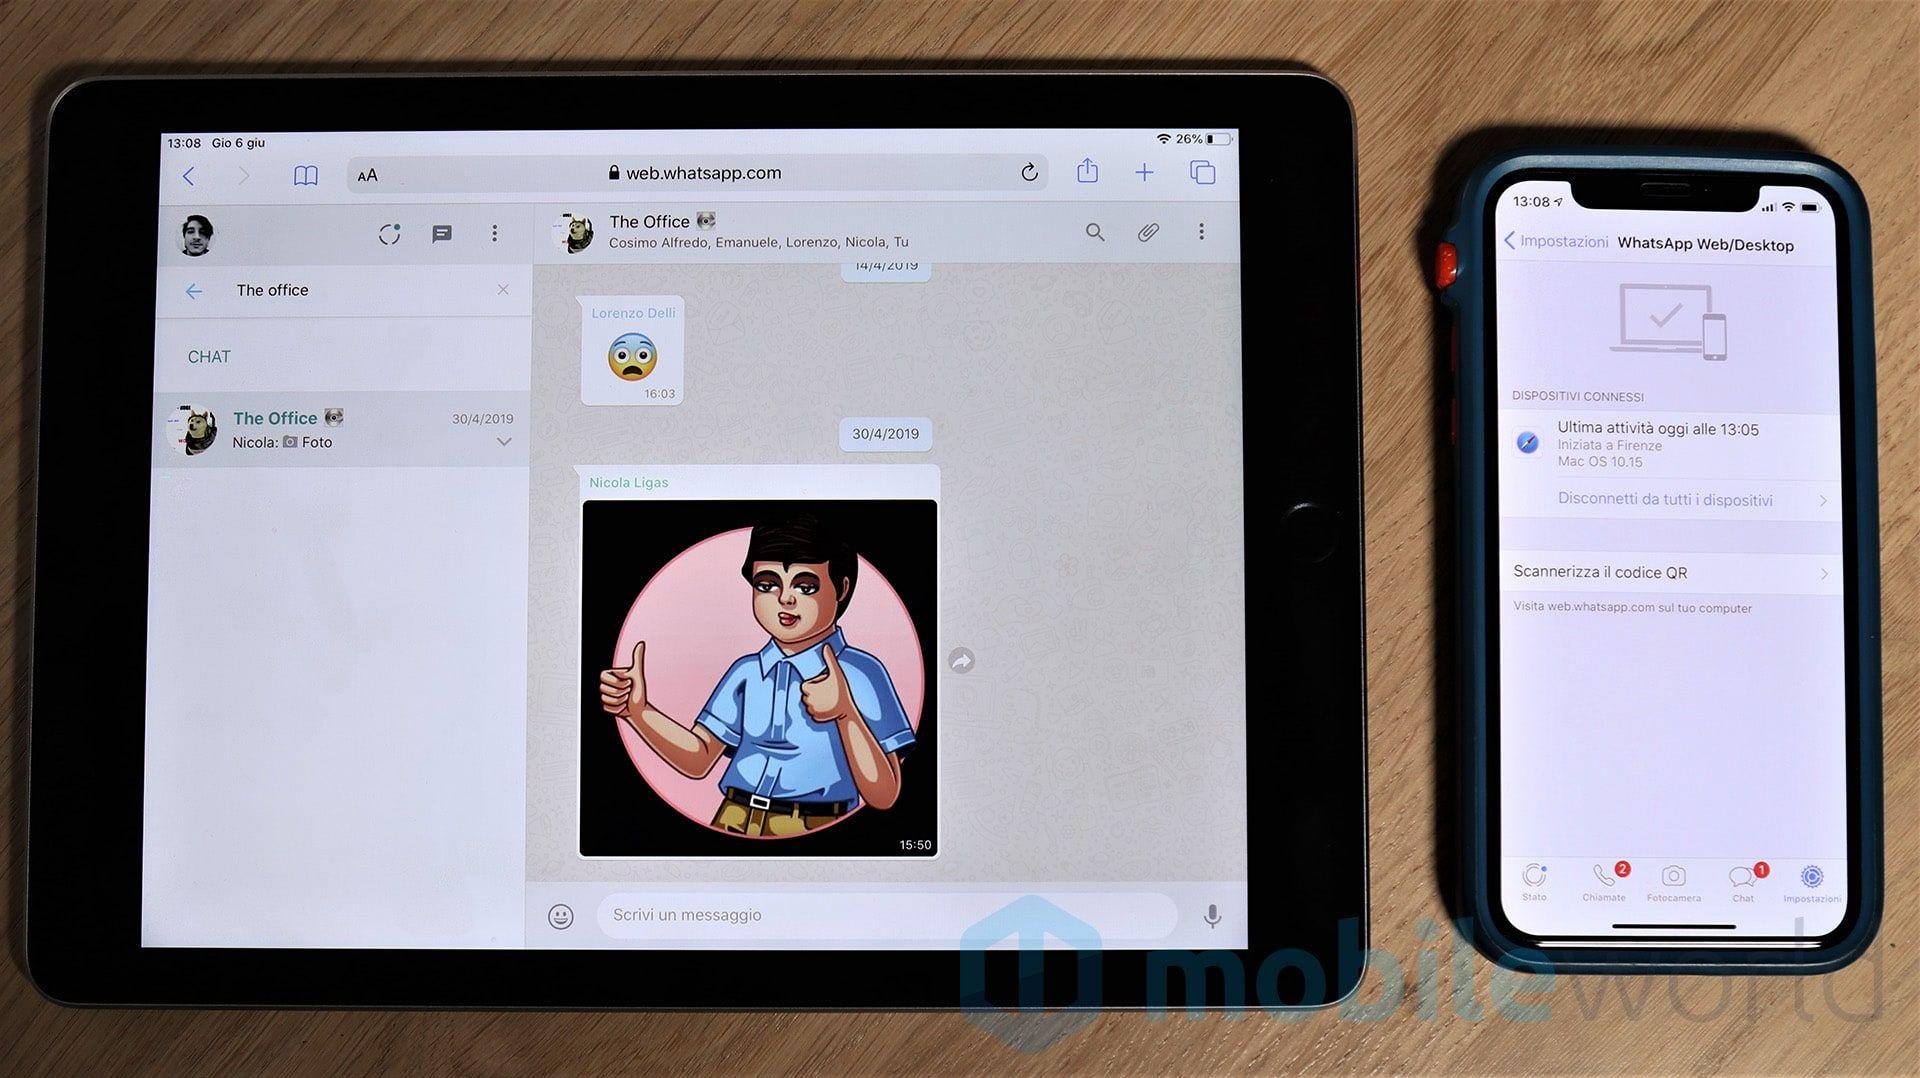 WhatsApp Web su iPad? Sì, con iPadOS! (con immagini) Ipad